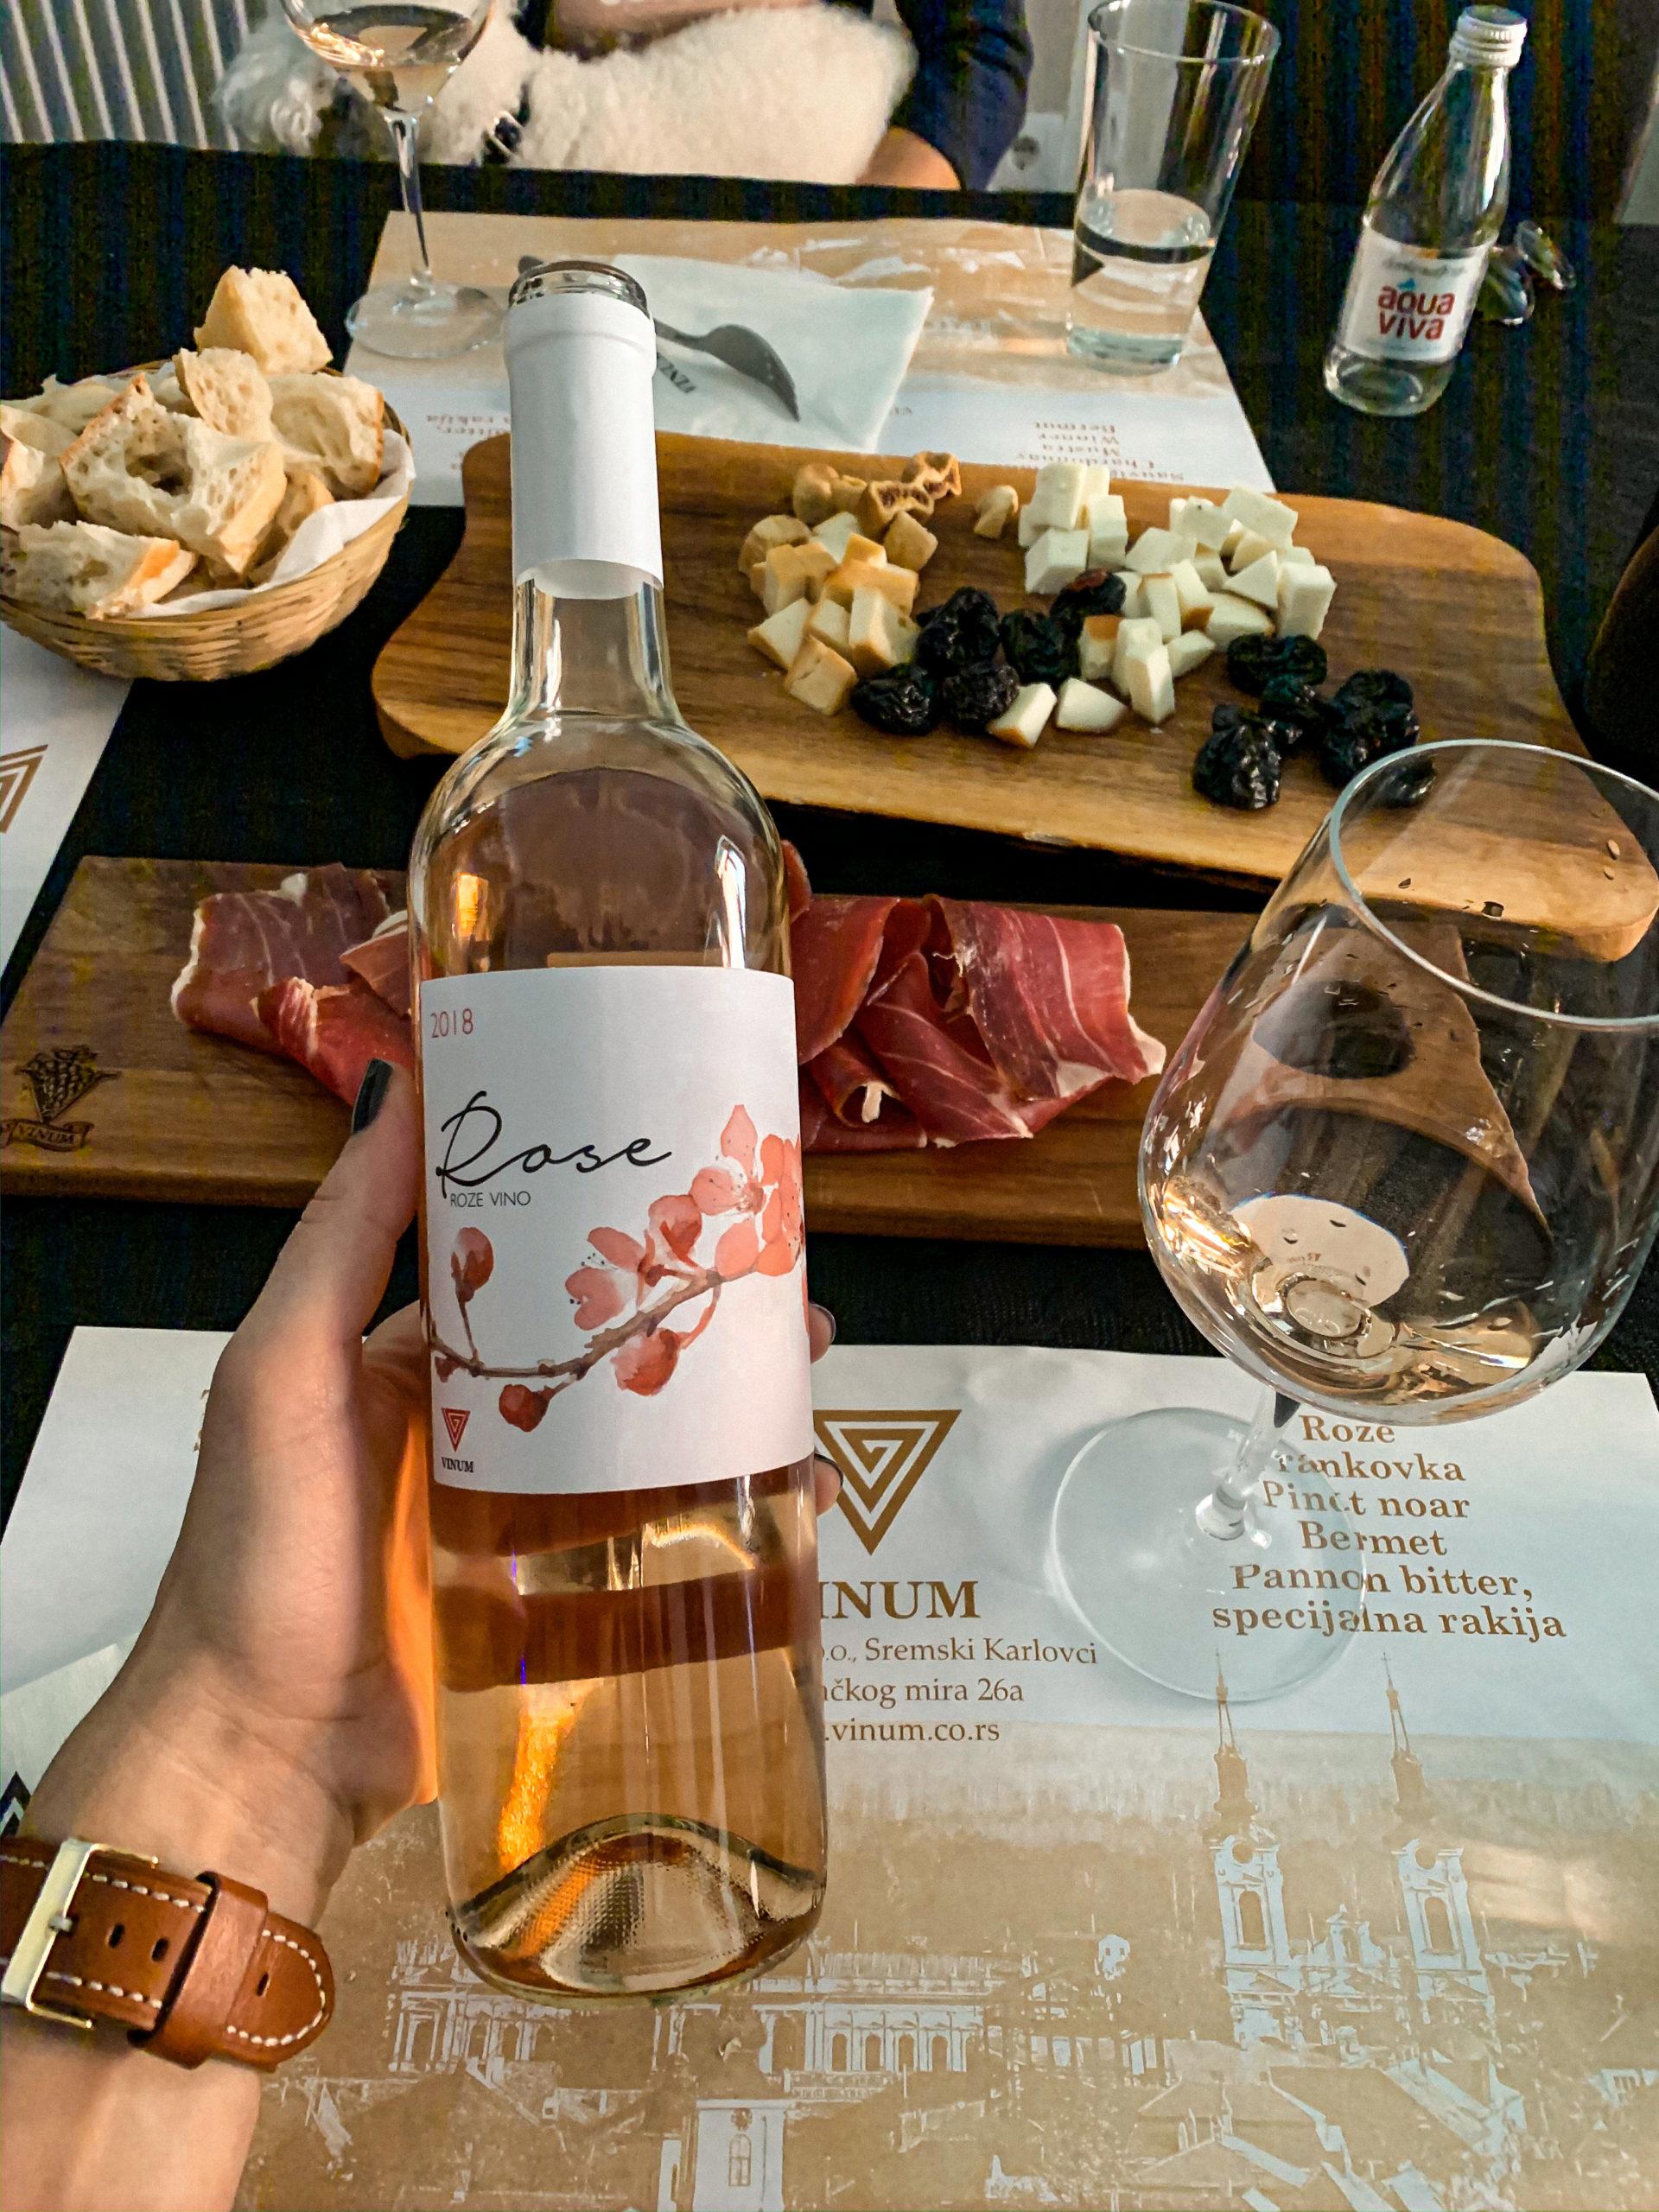 Rose vinarije Vinum